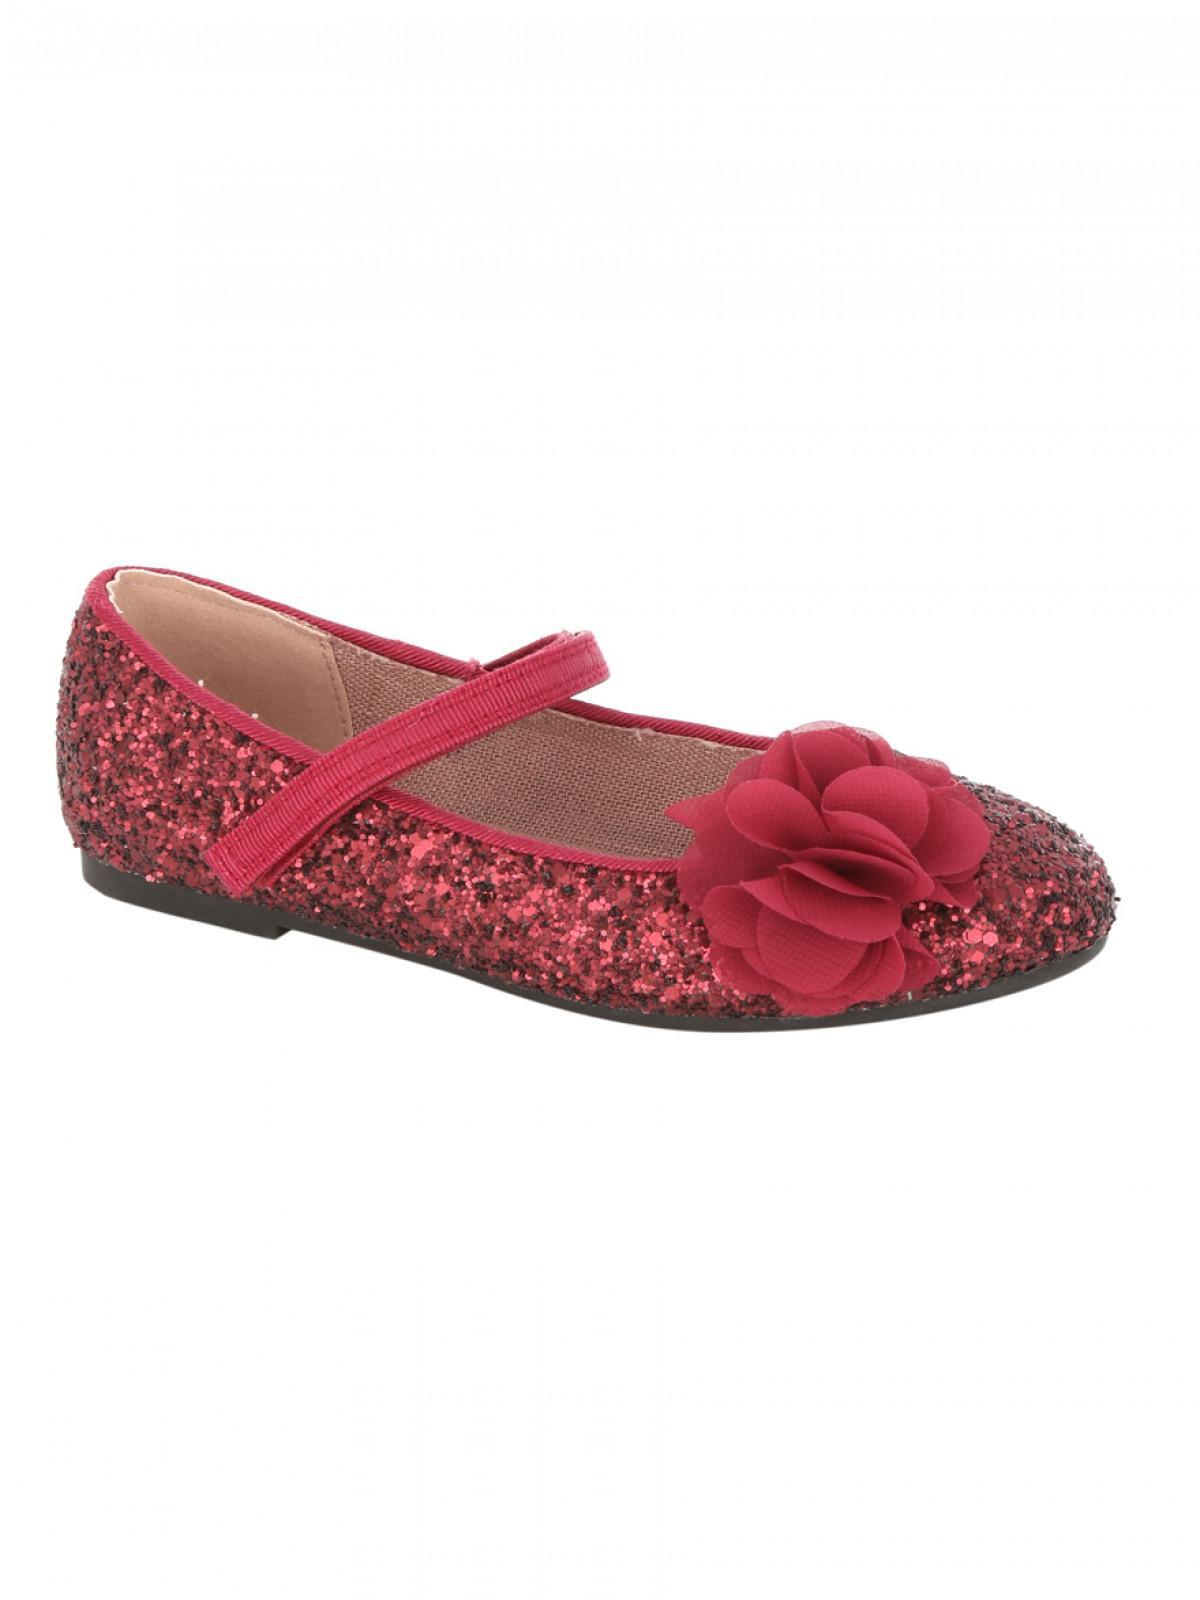 Christmas Shoes For Girls.Girls Younger Girls Flower Trim Glitter Christmas Shoes